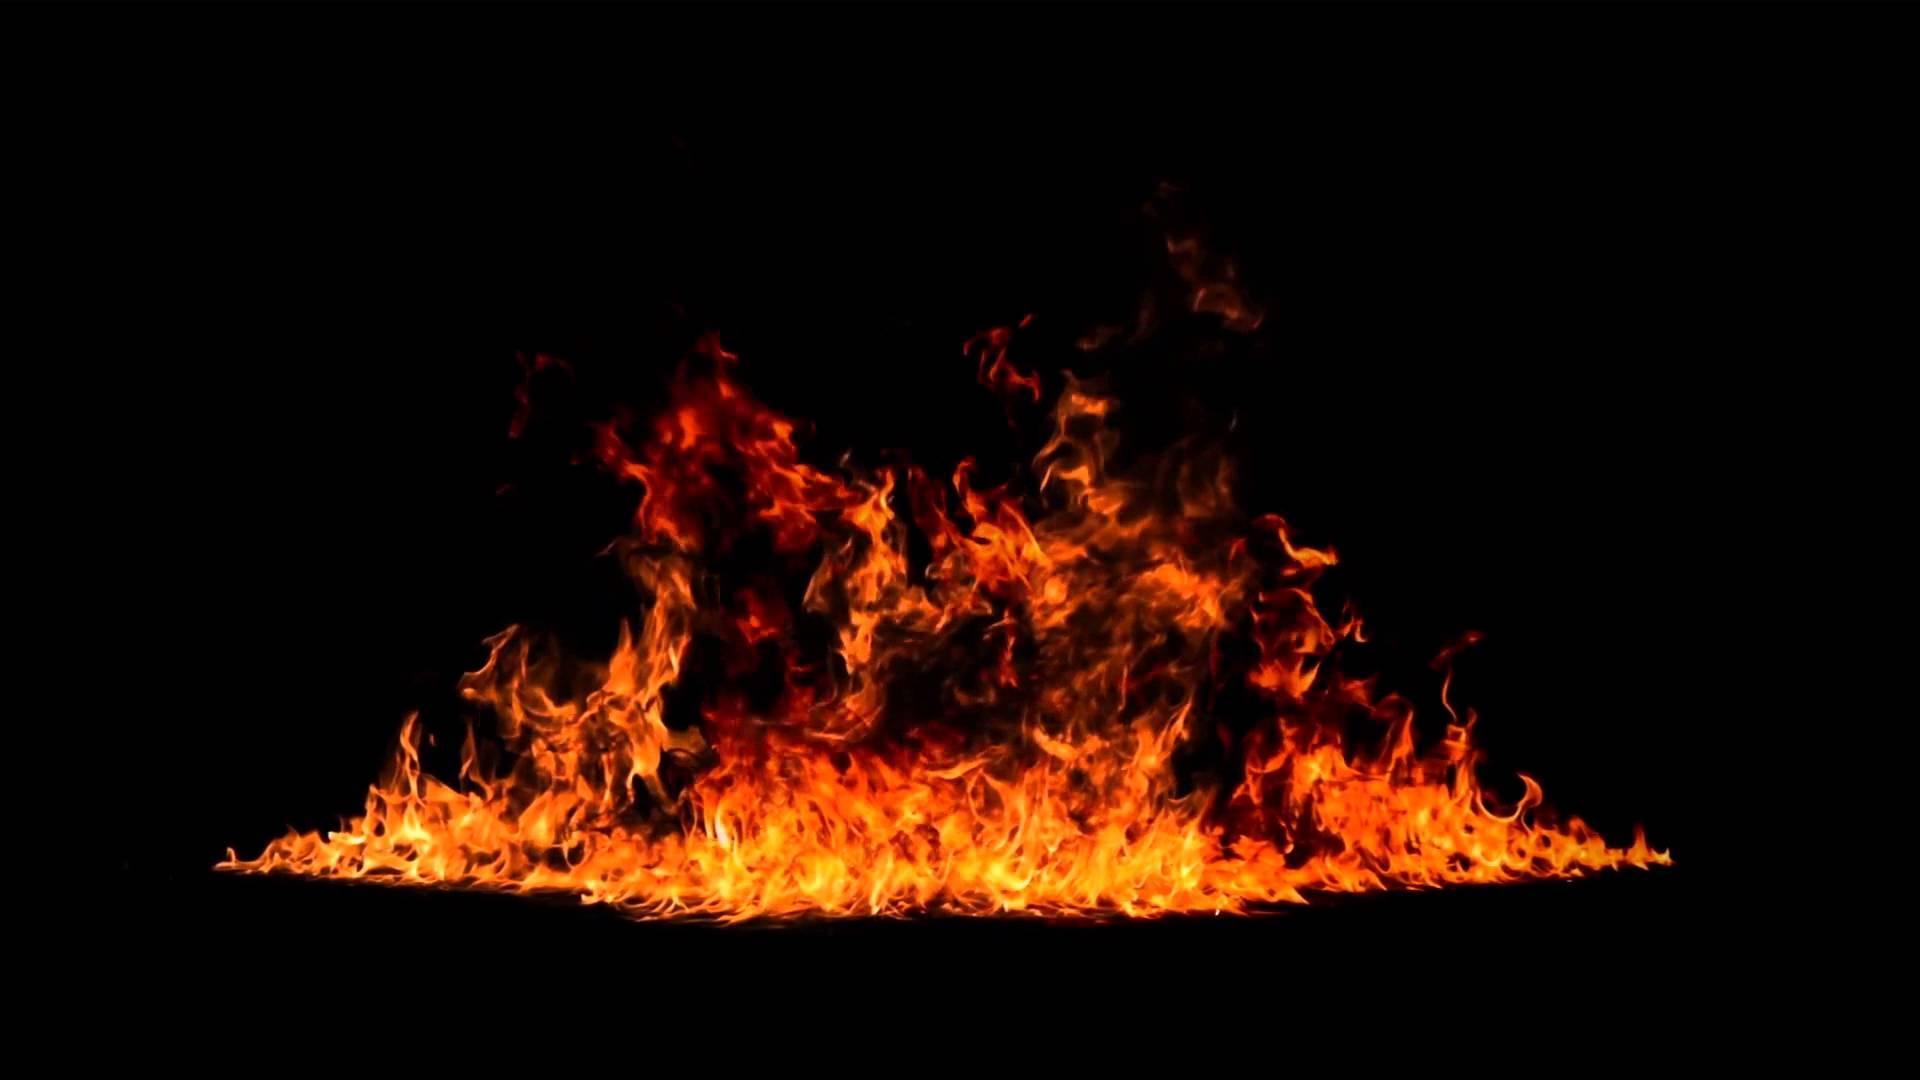 огонь костер пламя fire the flame на телефон